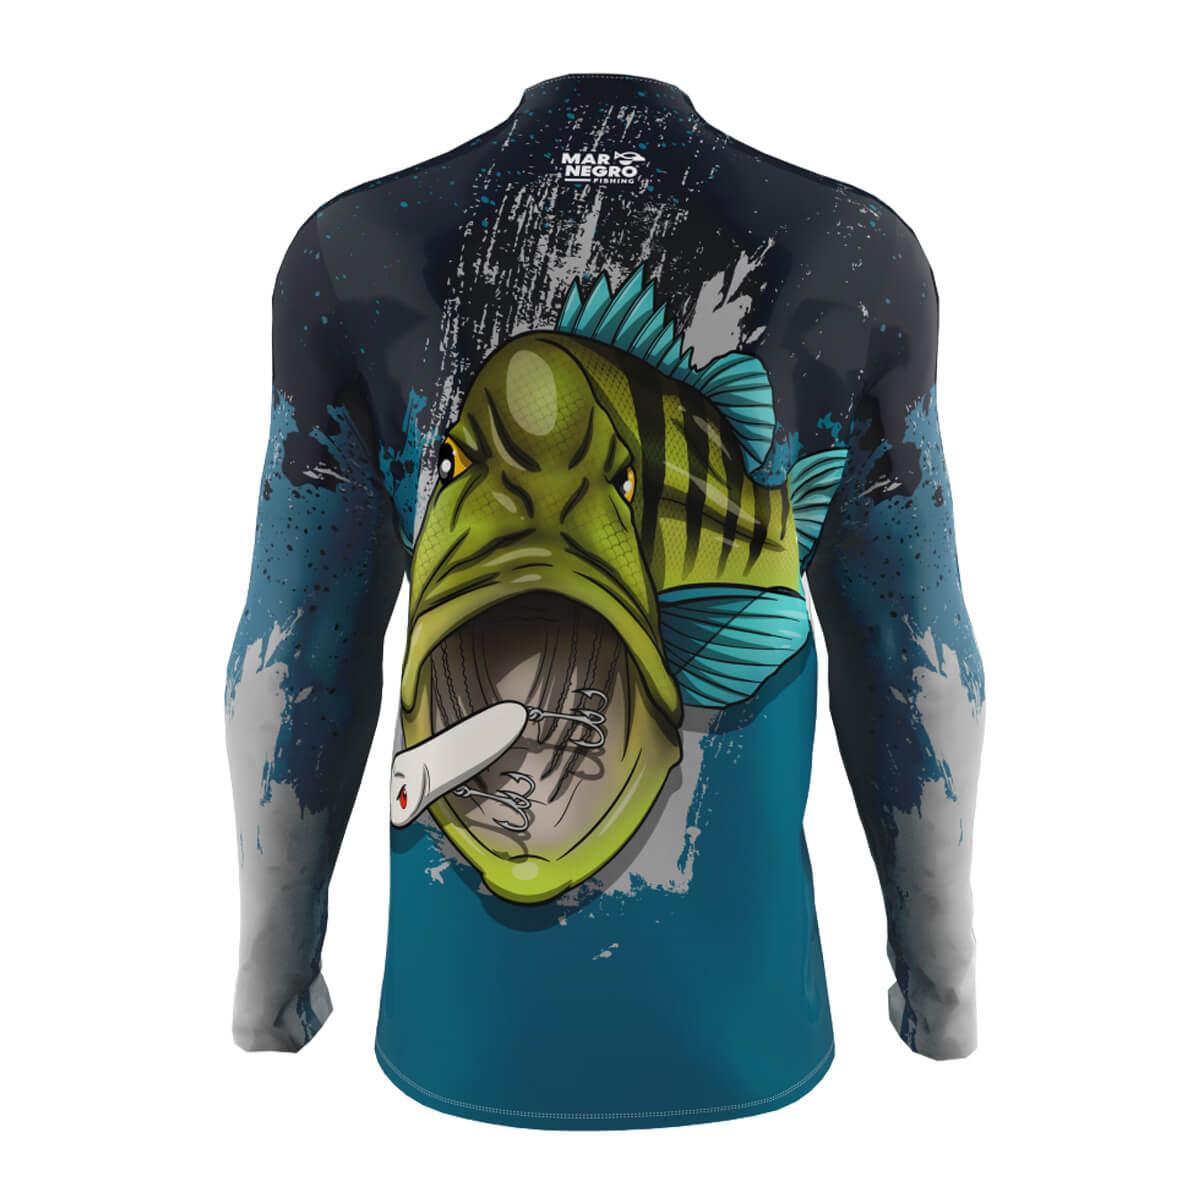 Camiseta Mar Negro 2021 Tucunaré Azul  - Pró Pesca Shop